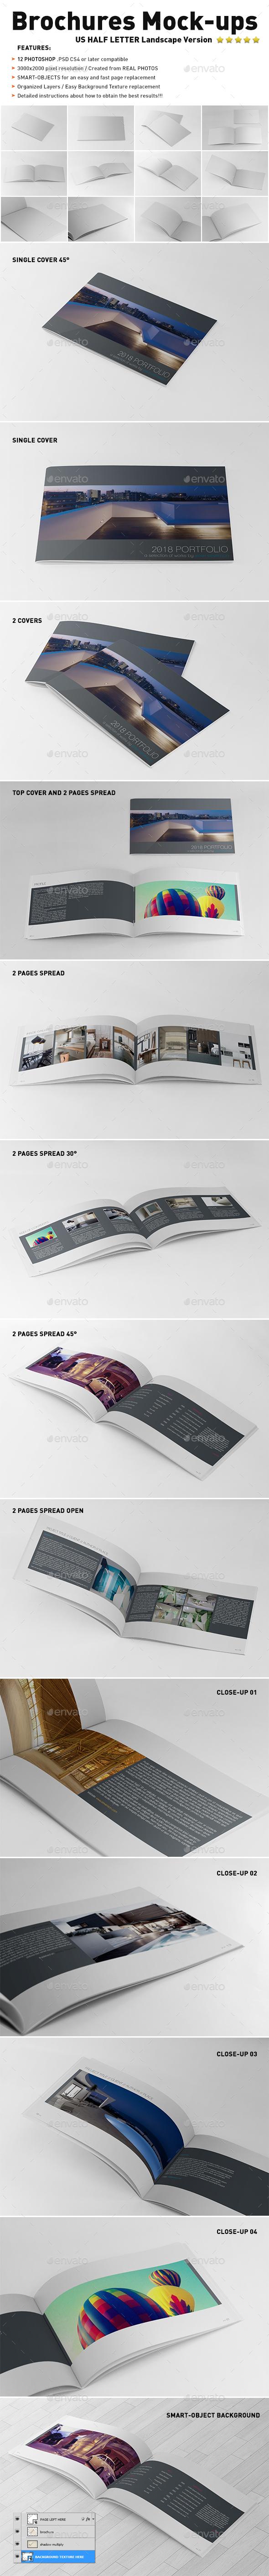 Photorealistic US Half Letter Brochure Mockups - Brochures Print